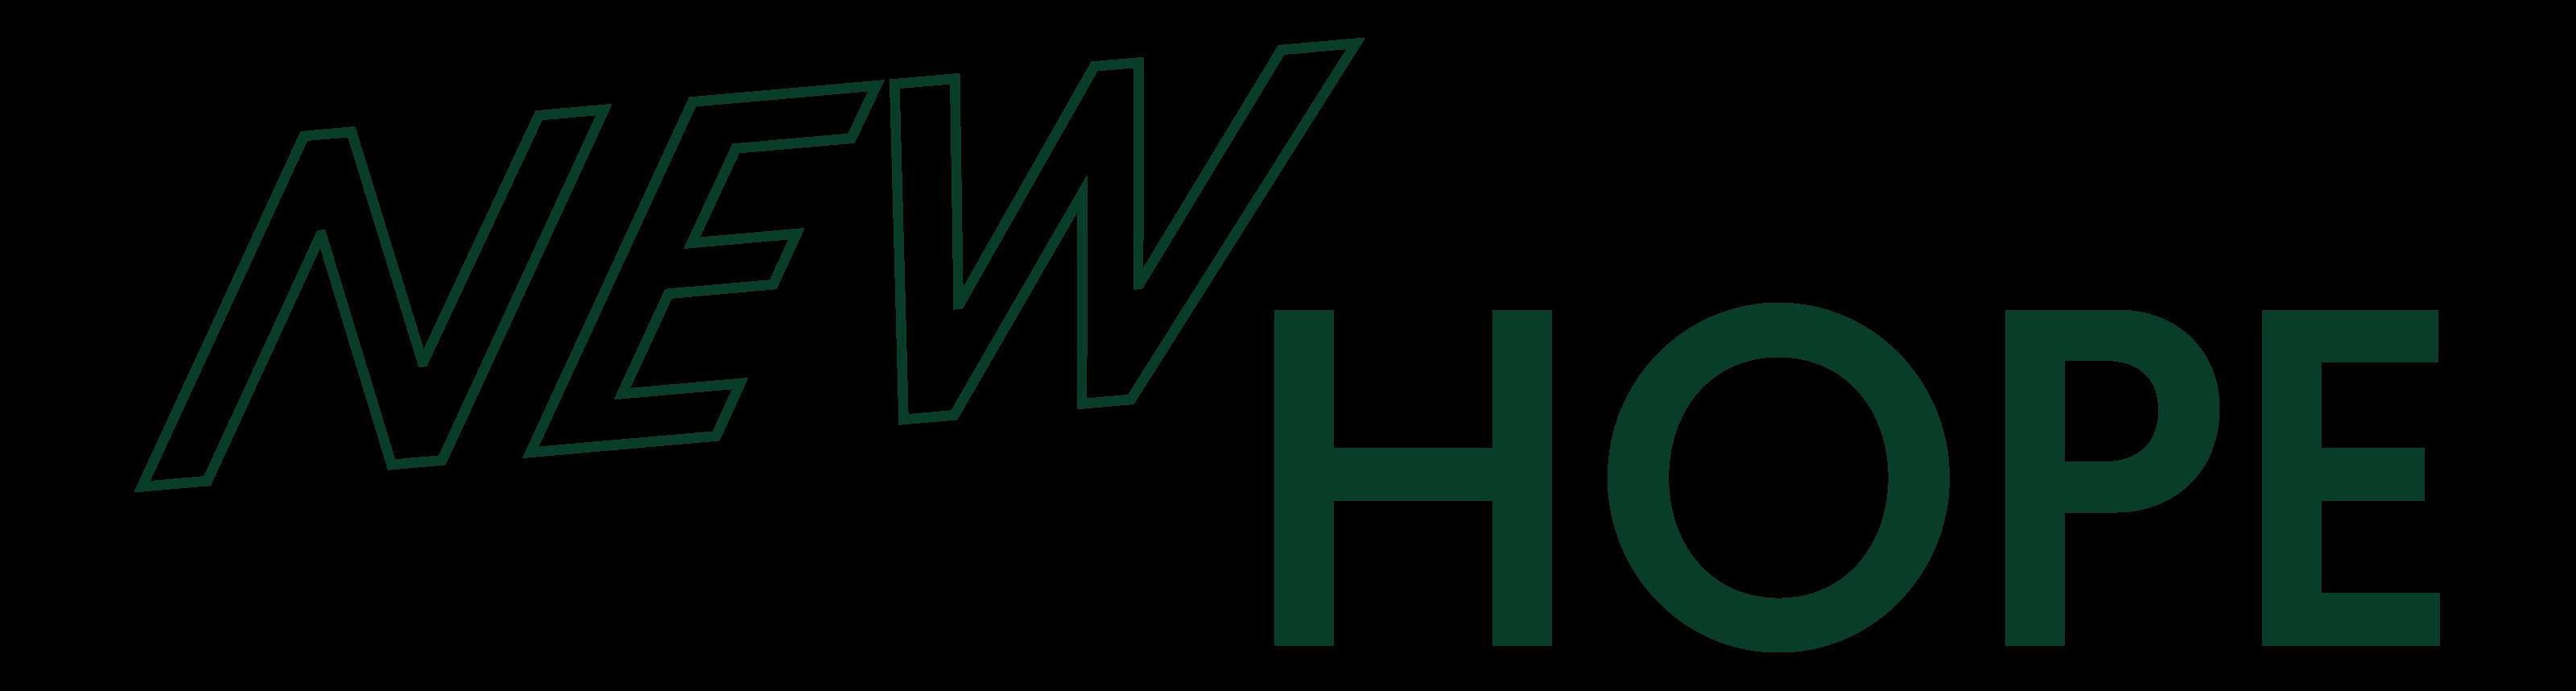 ROYVDCO_NEWHOPE_HORIZONTAAL